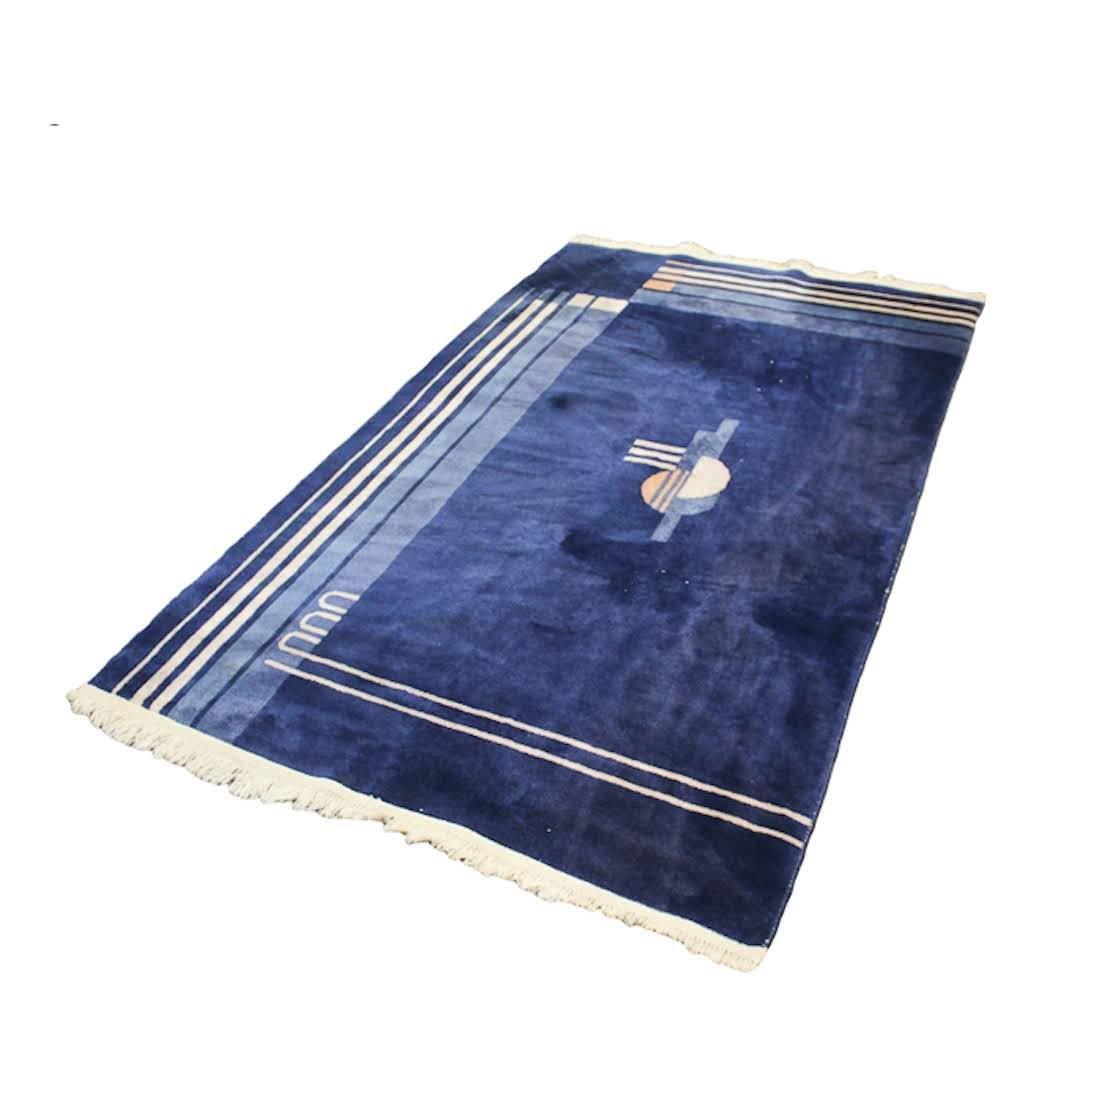 Chinese Art Deco Blue Geometric Rug